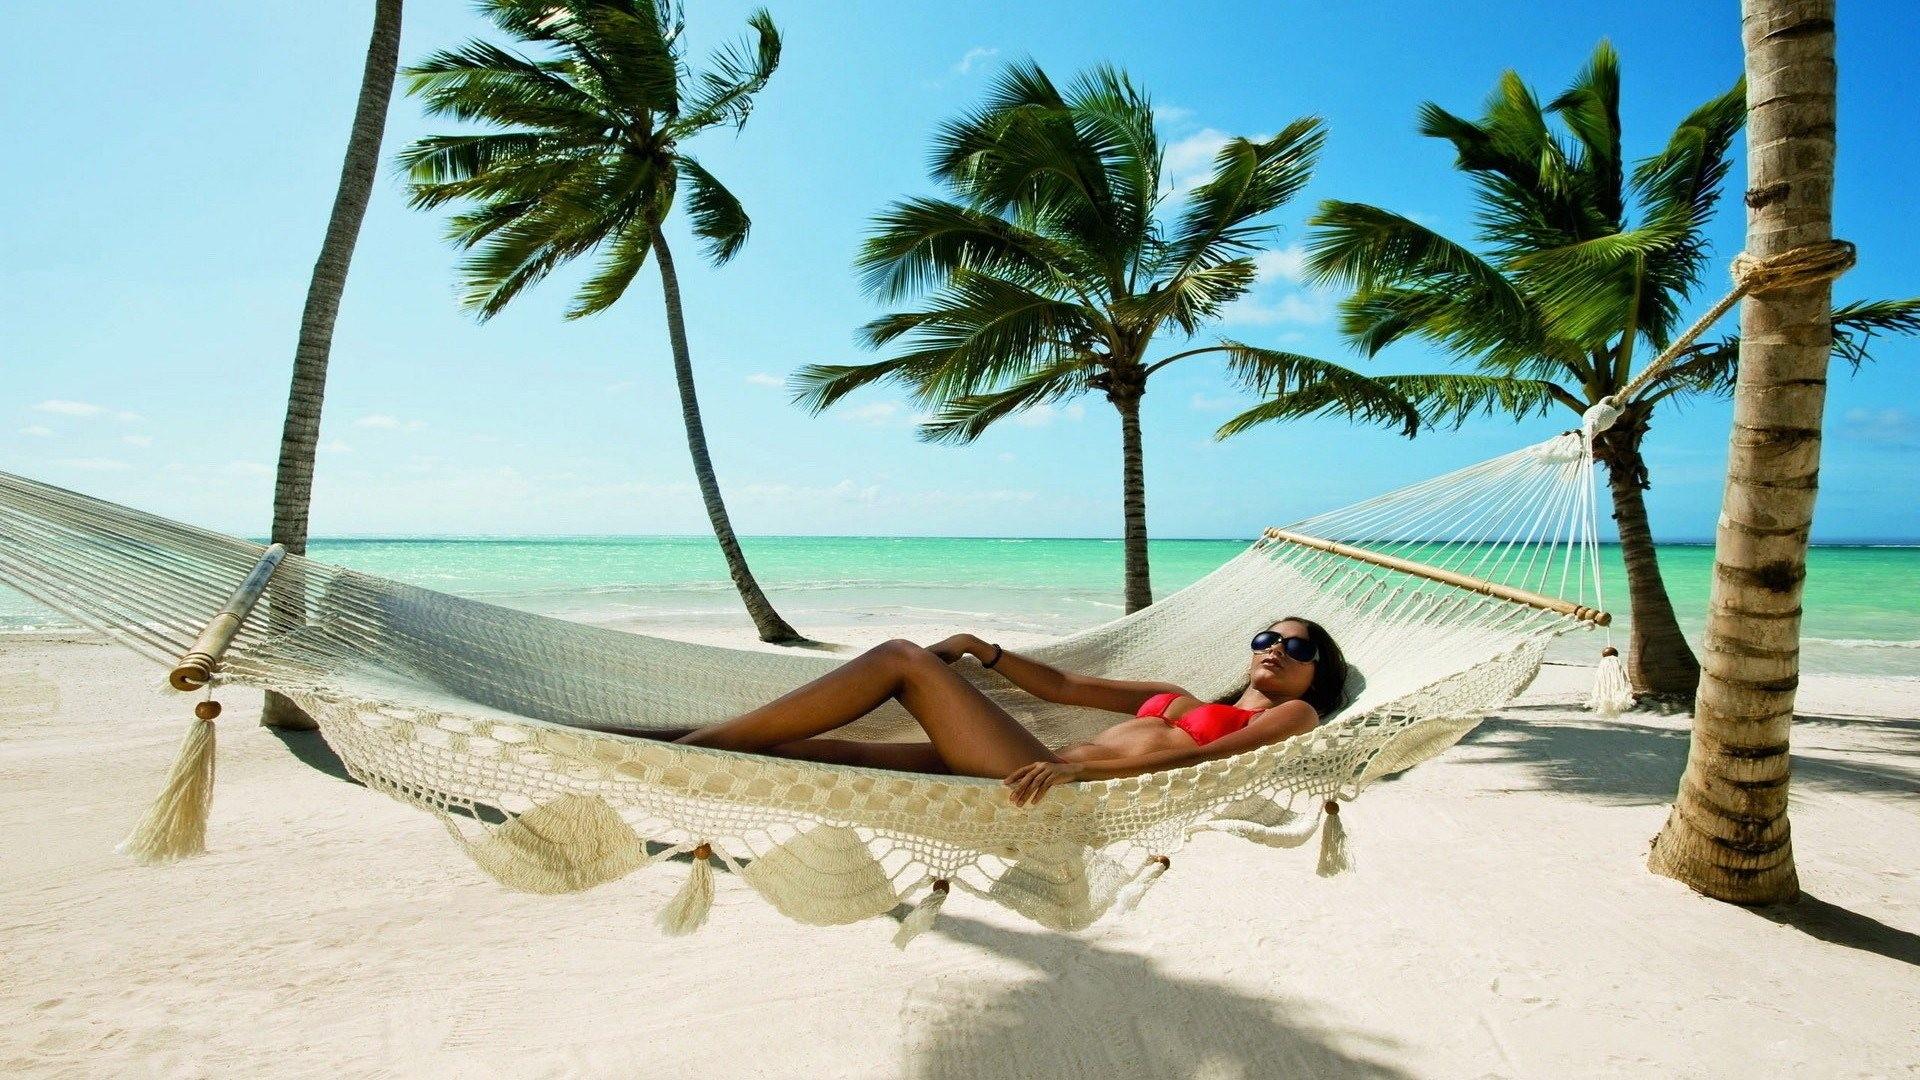 by hammock orange hammocks of the large chair shop hanging canada caribbean